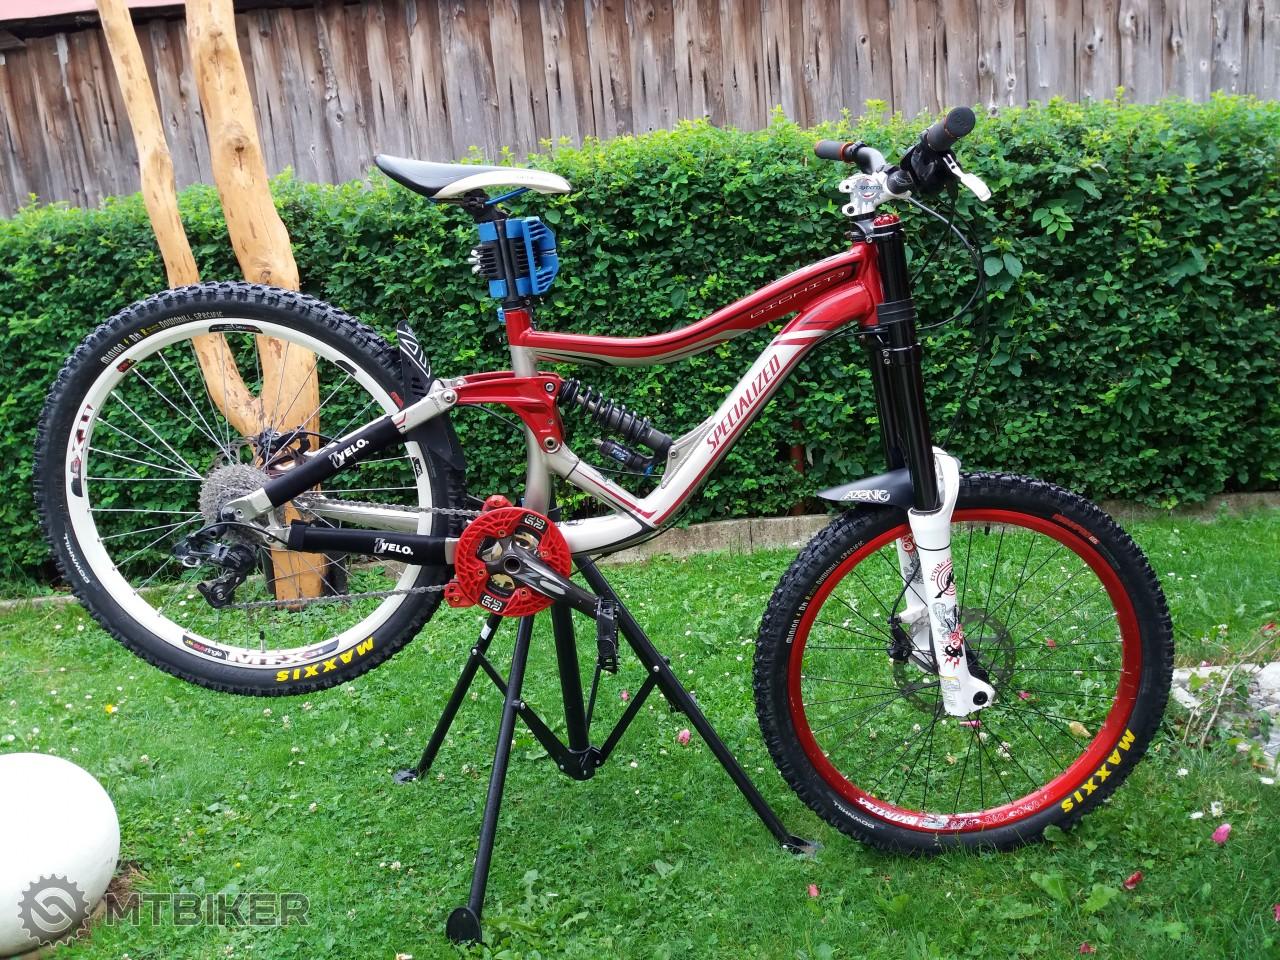 bc4b70d0ef52a Specialized Big Hit 3 Top (custom) - Bicykle - Celoodpružené - Bazár MTBIKER